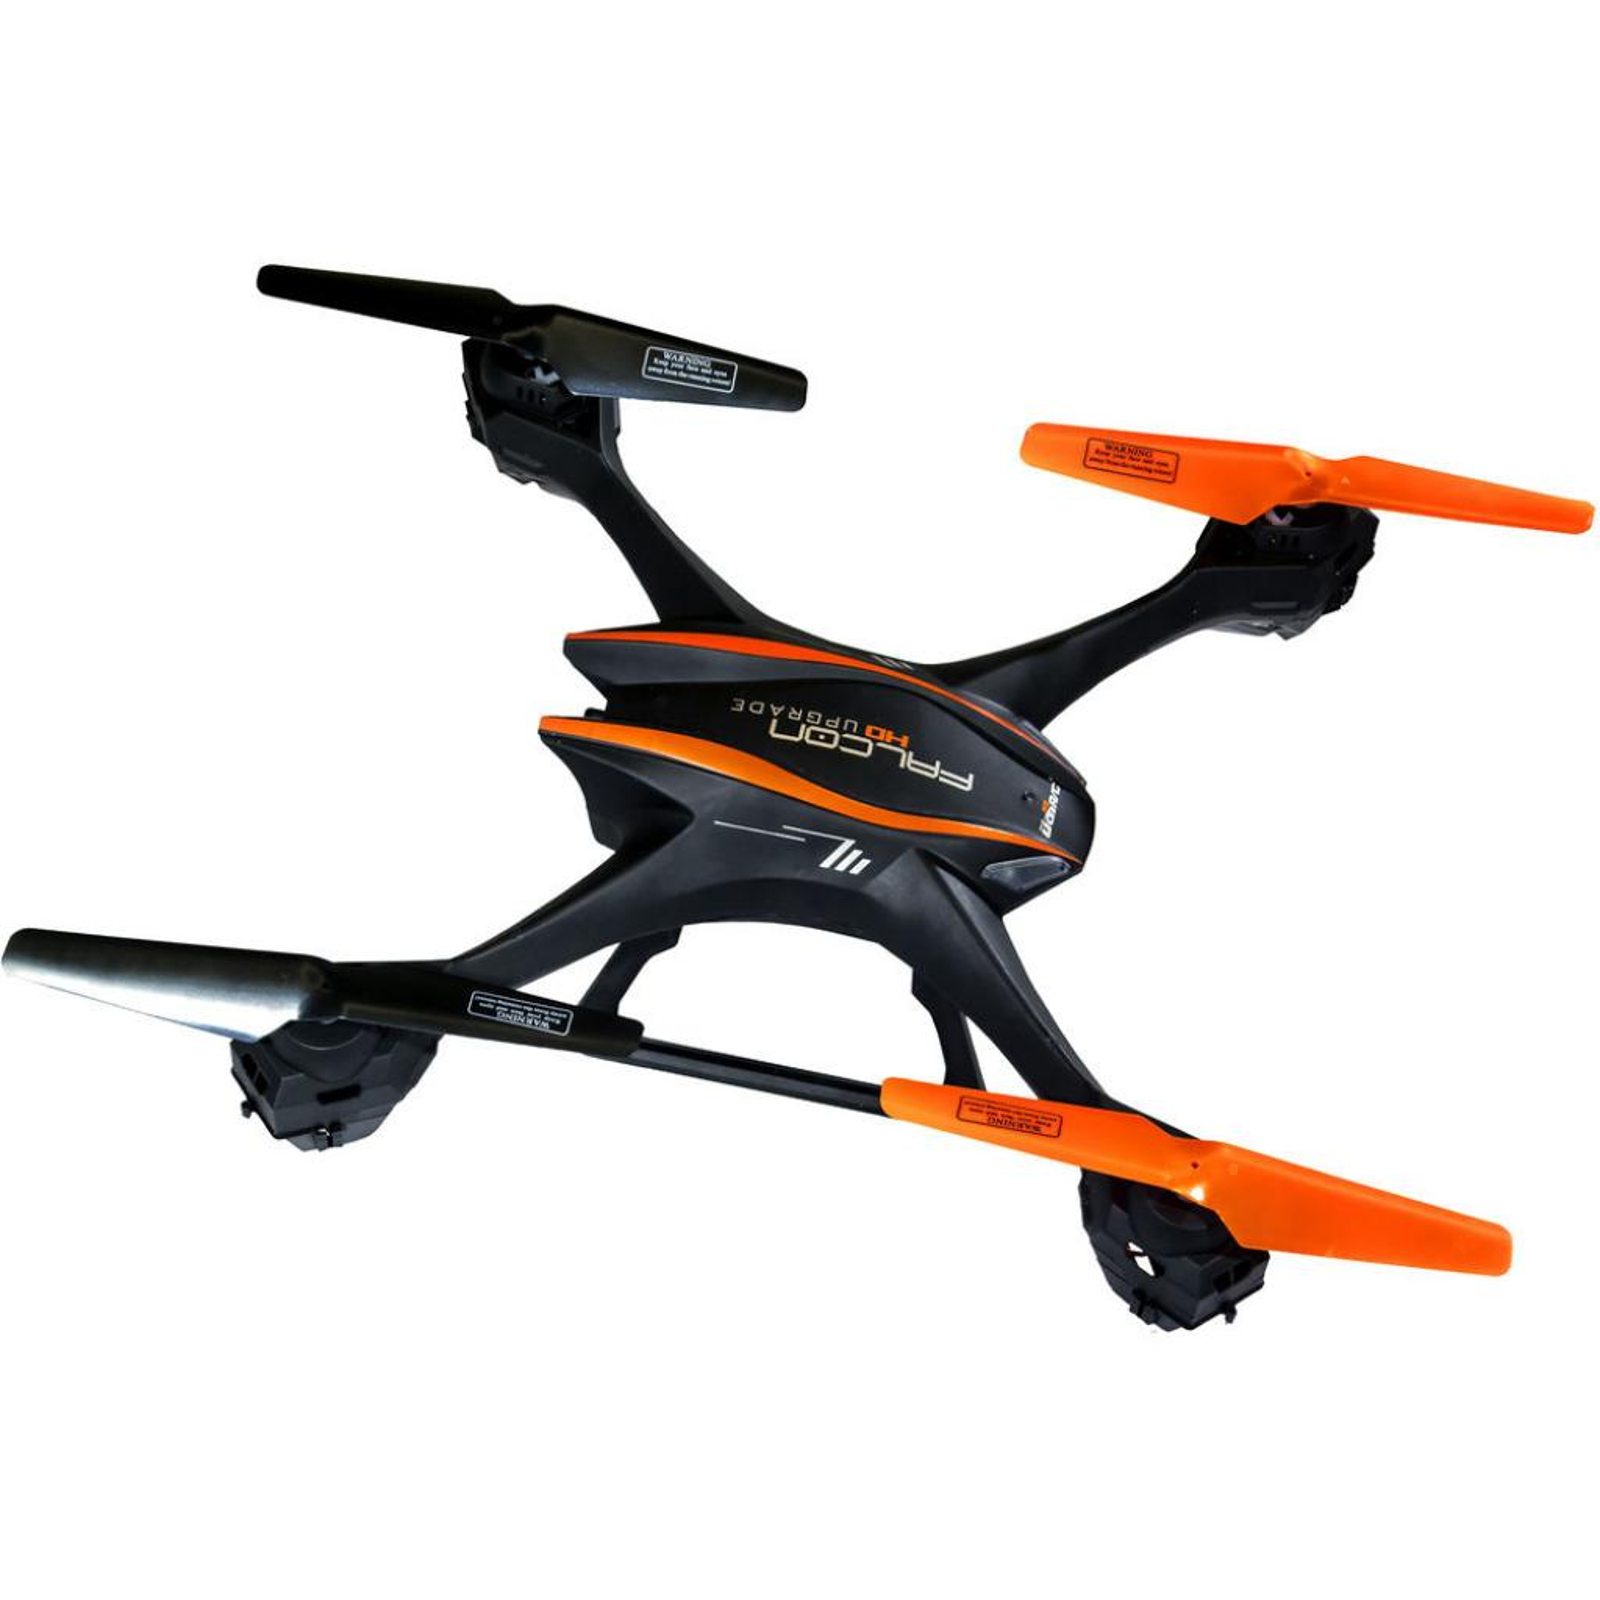 Квадрокоптер UDIRC U842 FALCON 2,4 GHz 486 мм HD бортовая камера 4CH (U842 Black) изображение 3